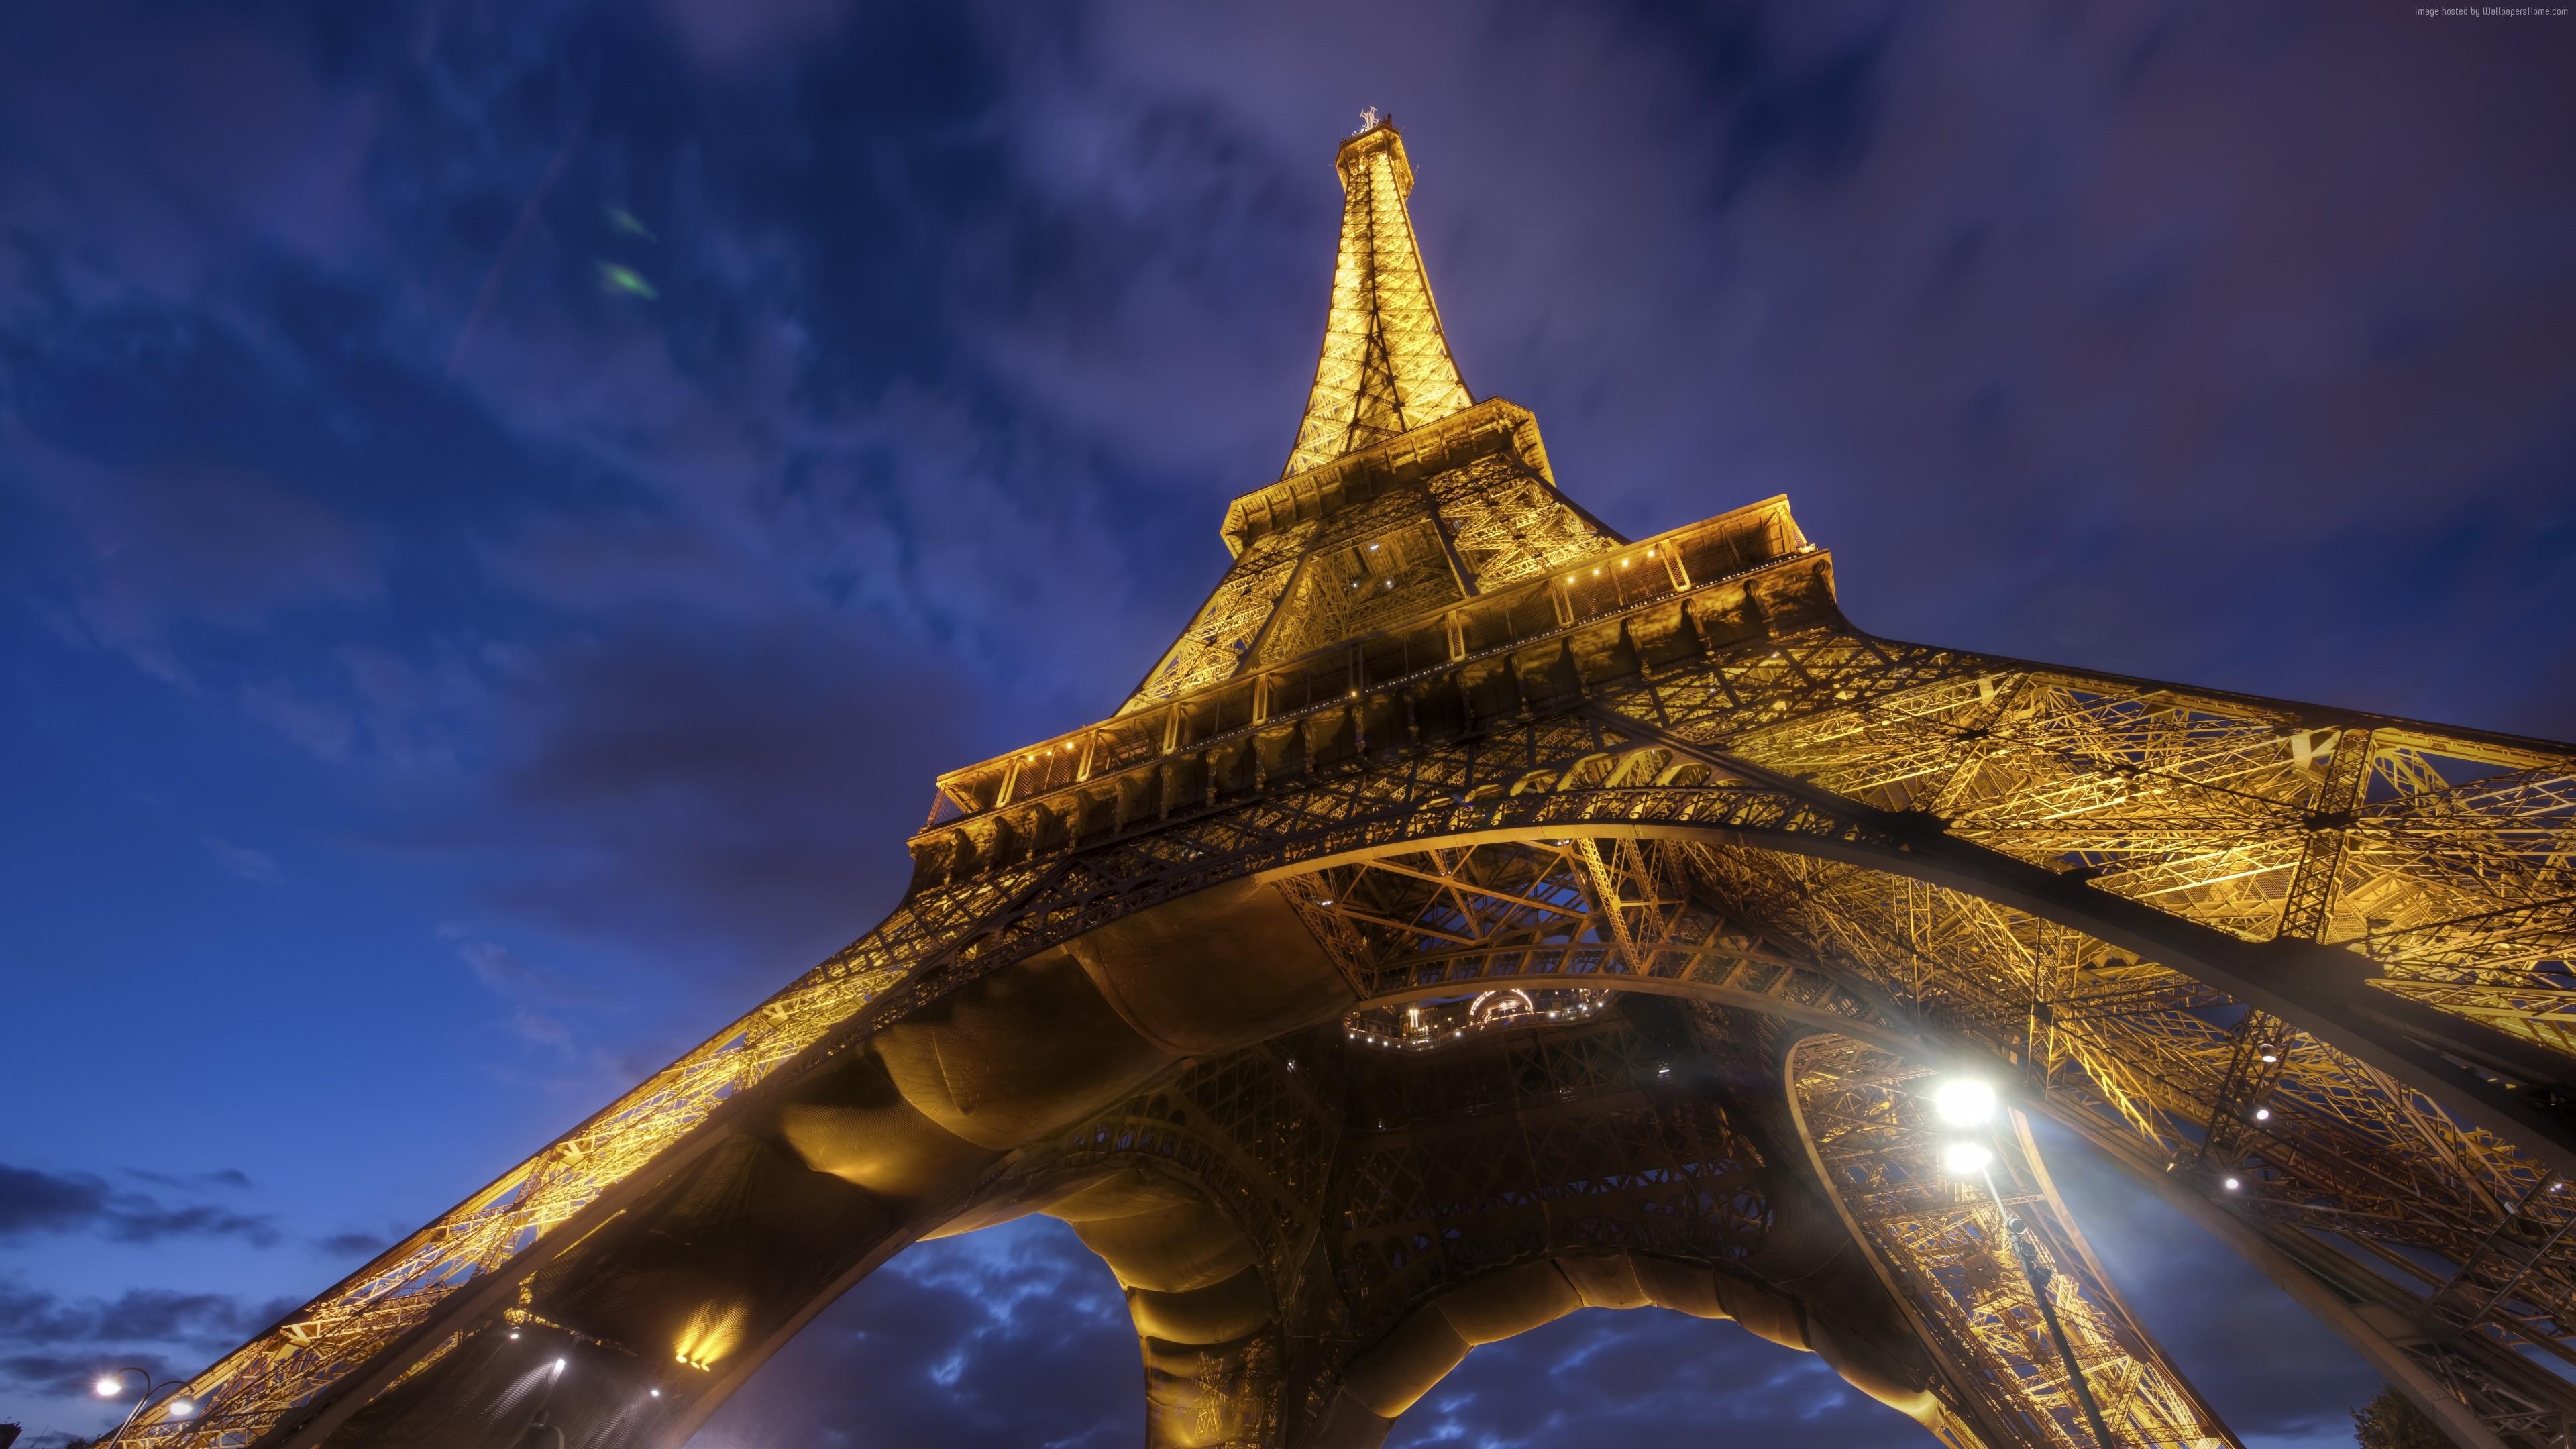 Wallpaper Eiffel Tower Paris France Travel Tourism Architecture Wallpaper Download High Resolution 4k Wallpaper